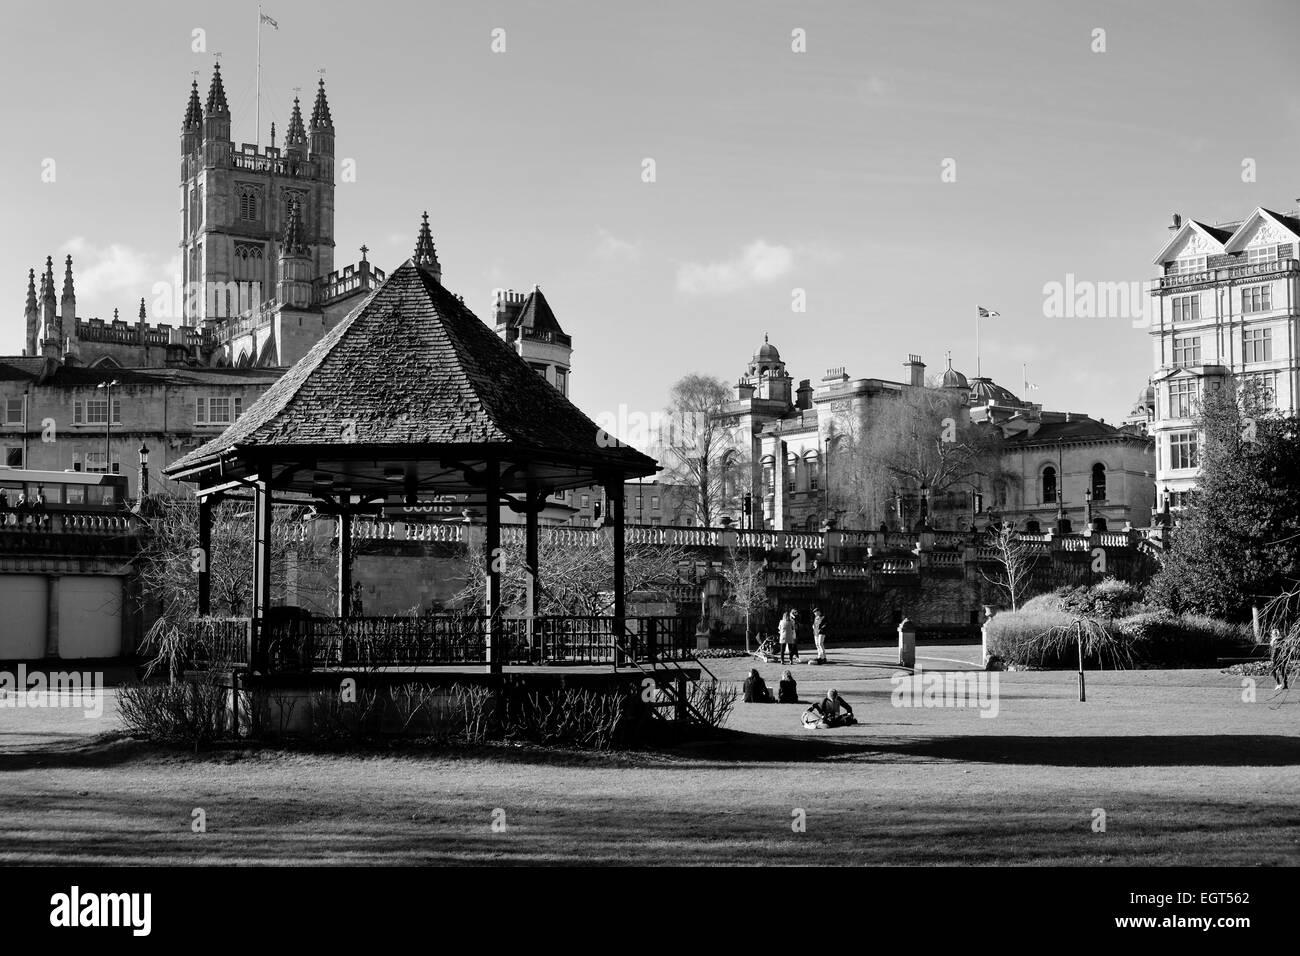 Bath, England, UK - 18 Feb 2015: Bayj Abbey viewed from Parade Gardens, Bath - Stock Image